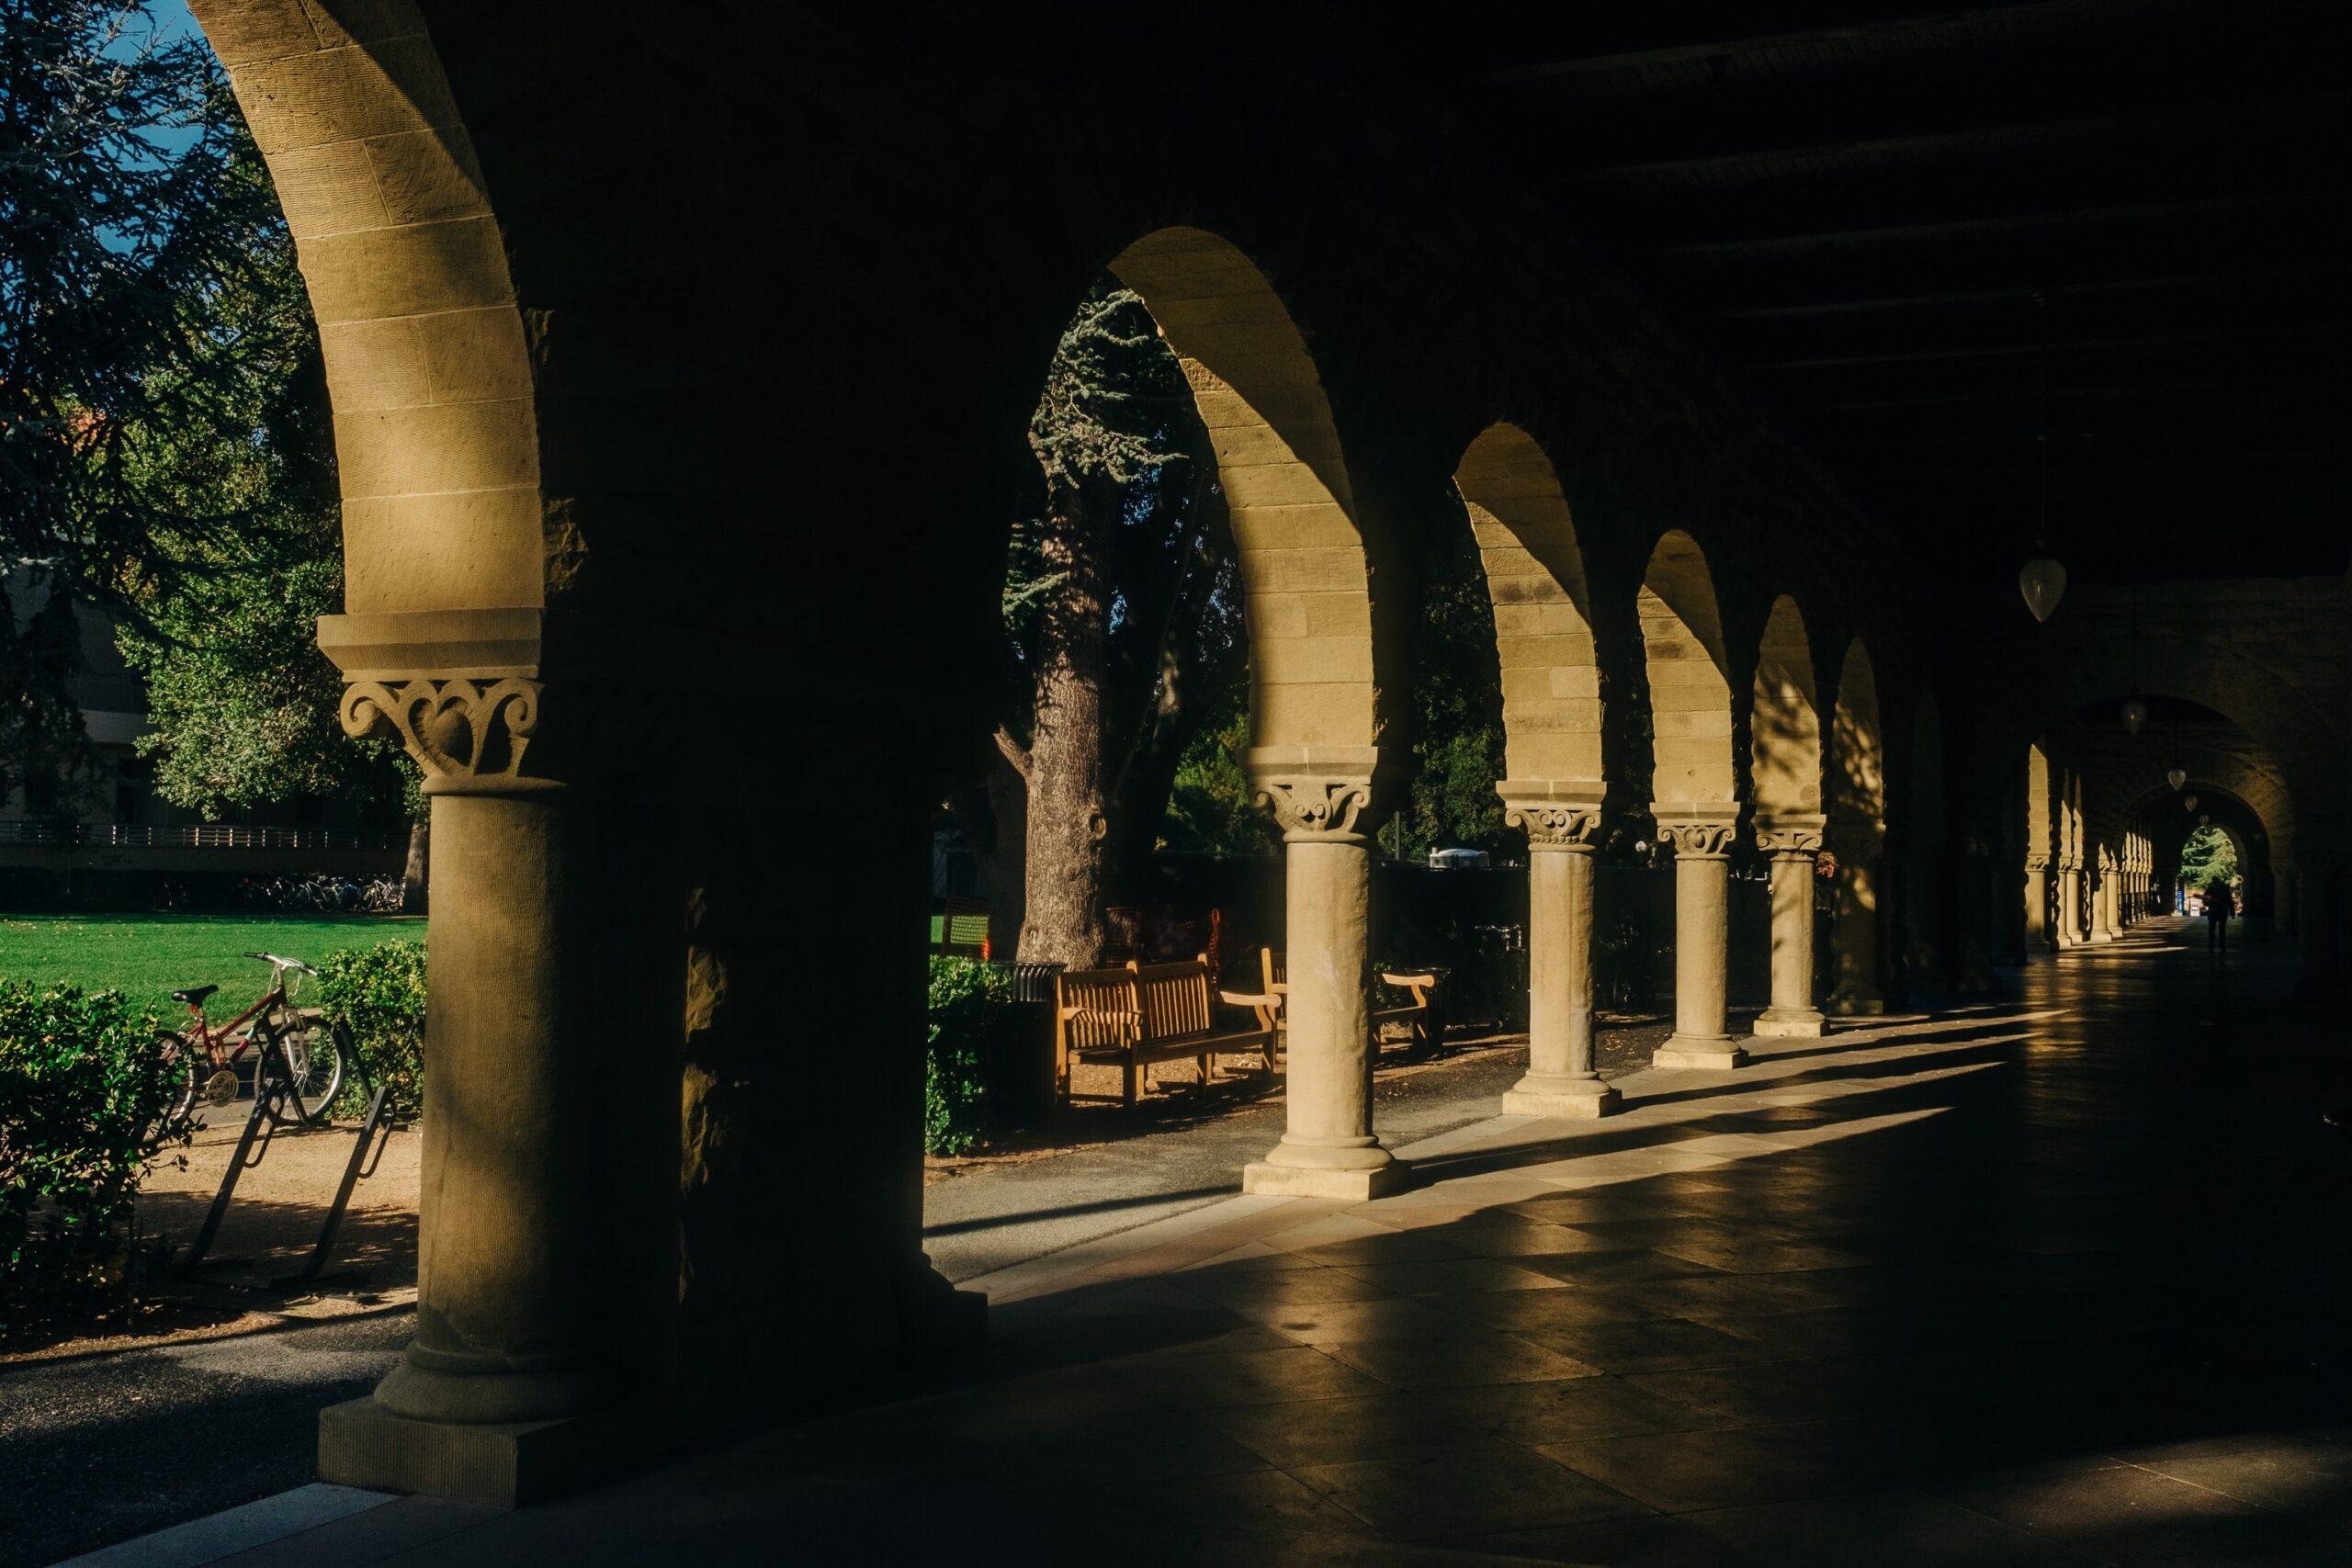 ashim-d-silva-Stanford Arches with shadow-unsplash